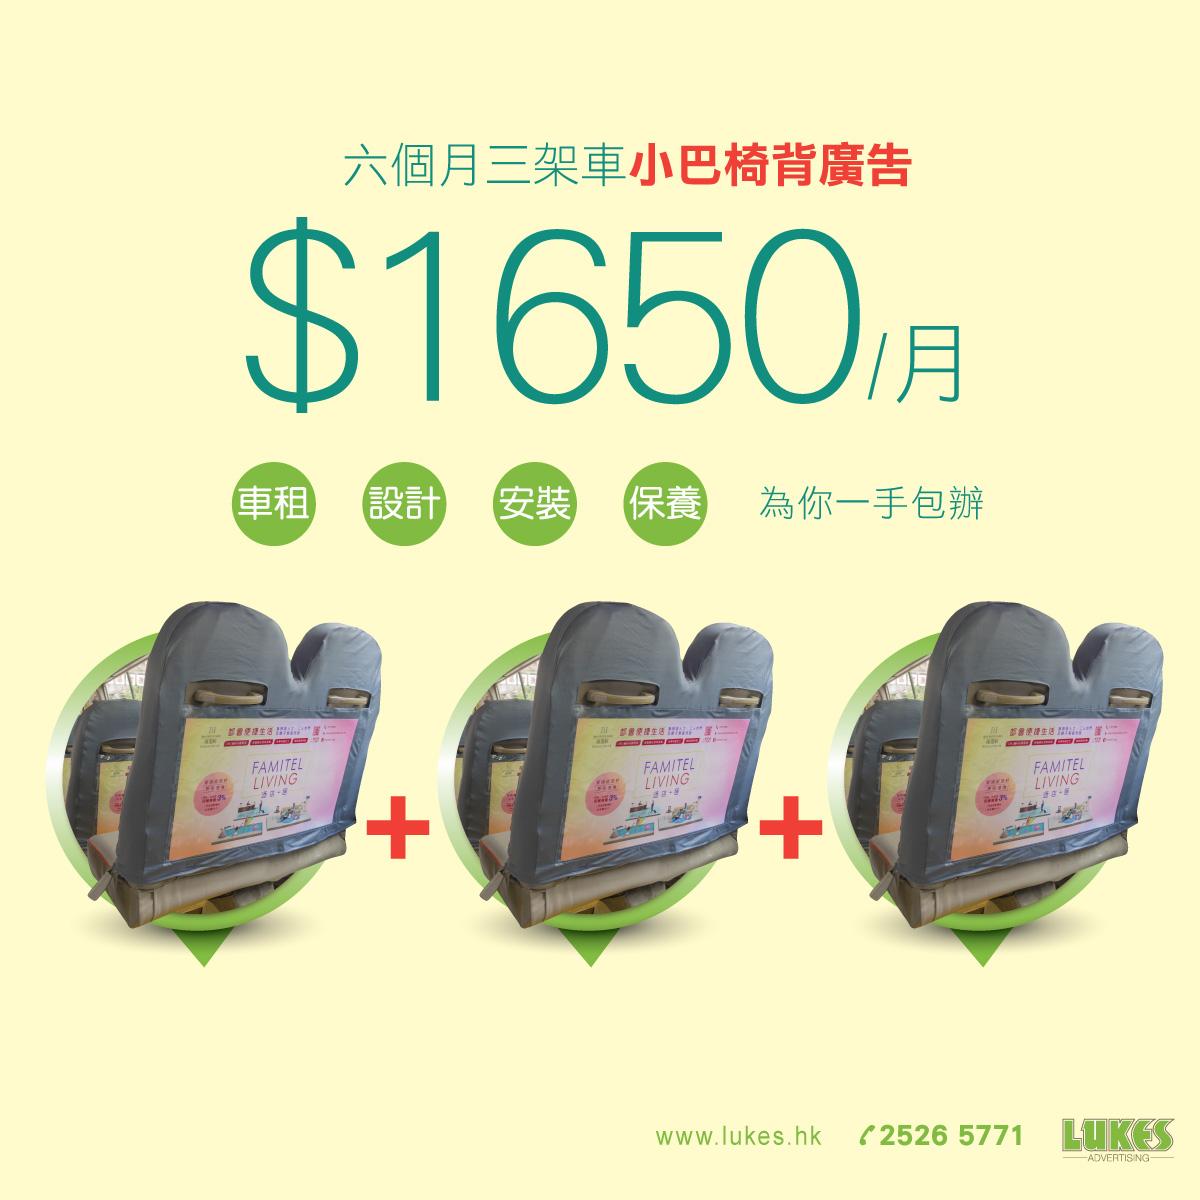 web_lukes-seatback-1200x1200-181214a